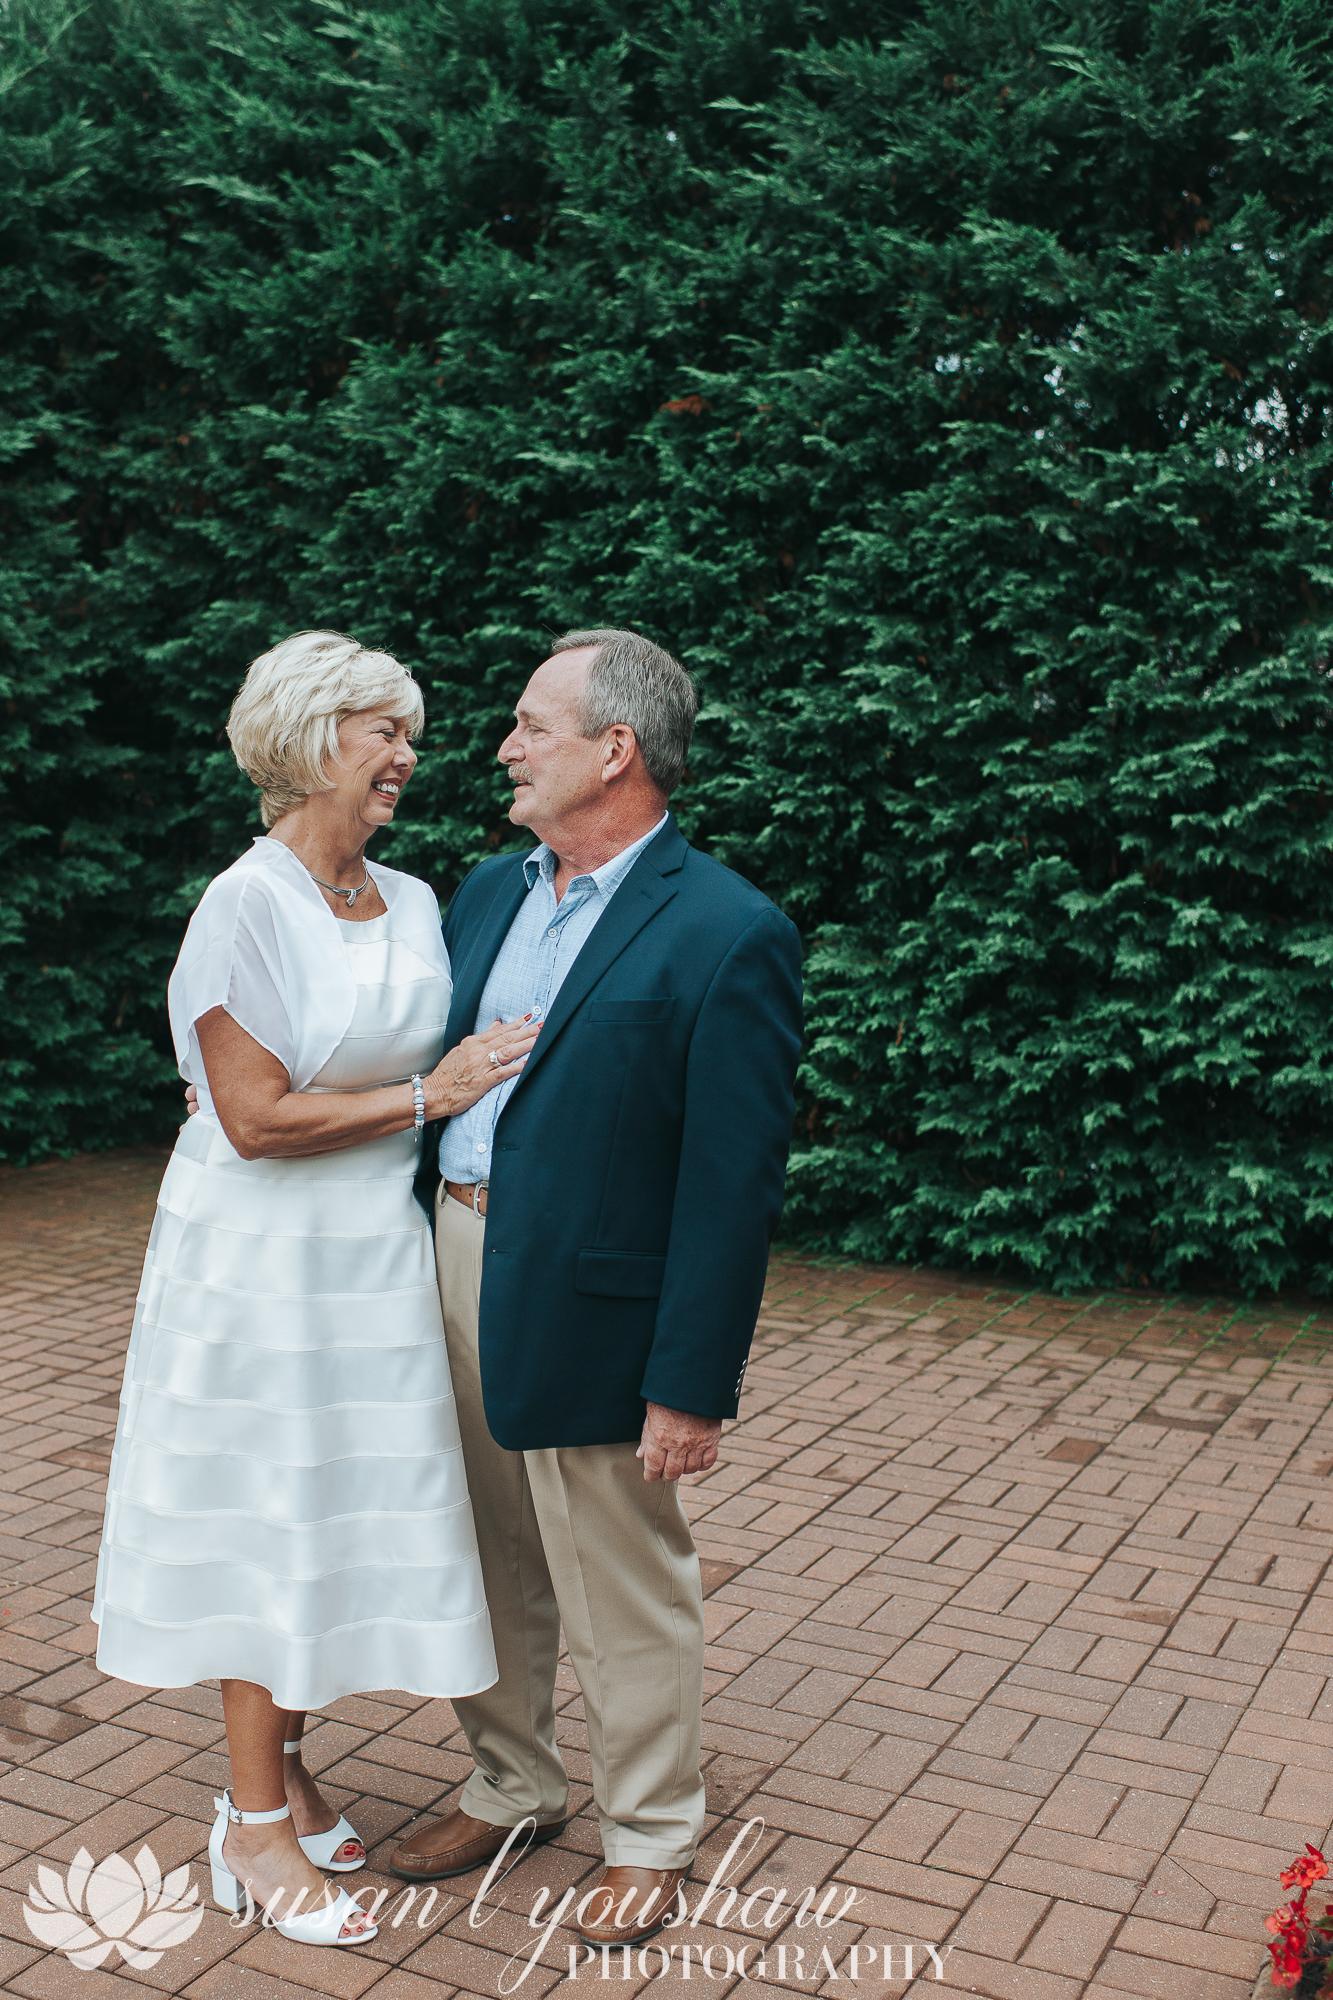 BLOG Carolyn Adams and Jim McCune 07-04-2018 SLY Photography-28.jpg